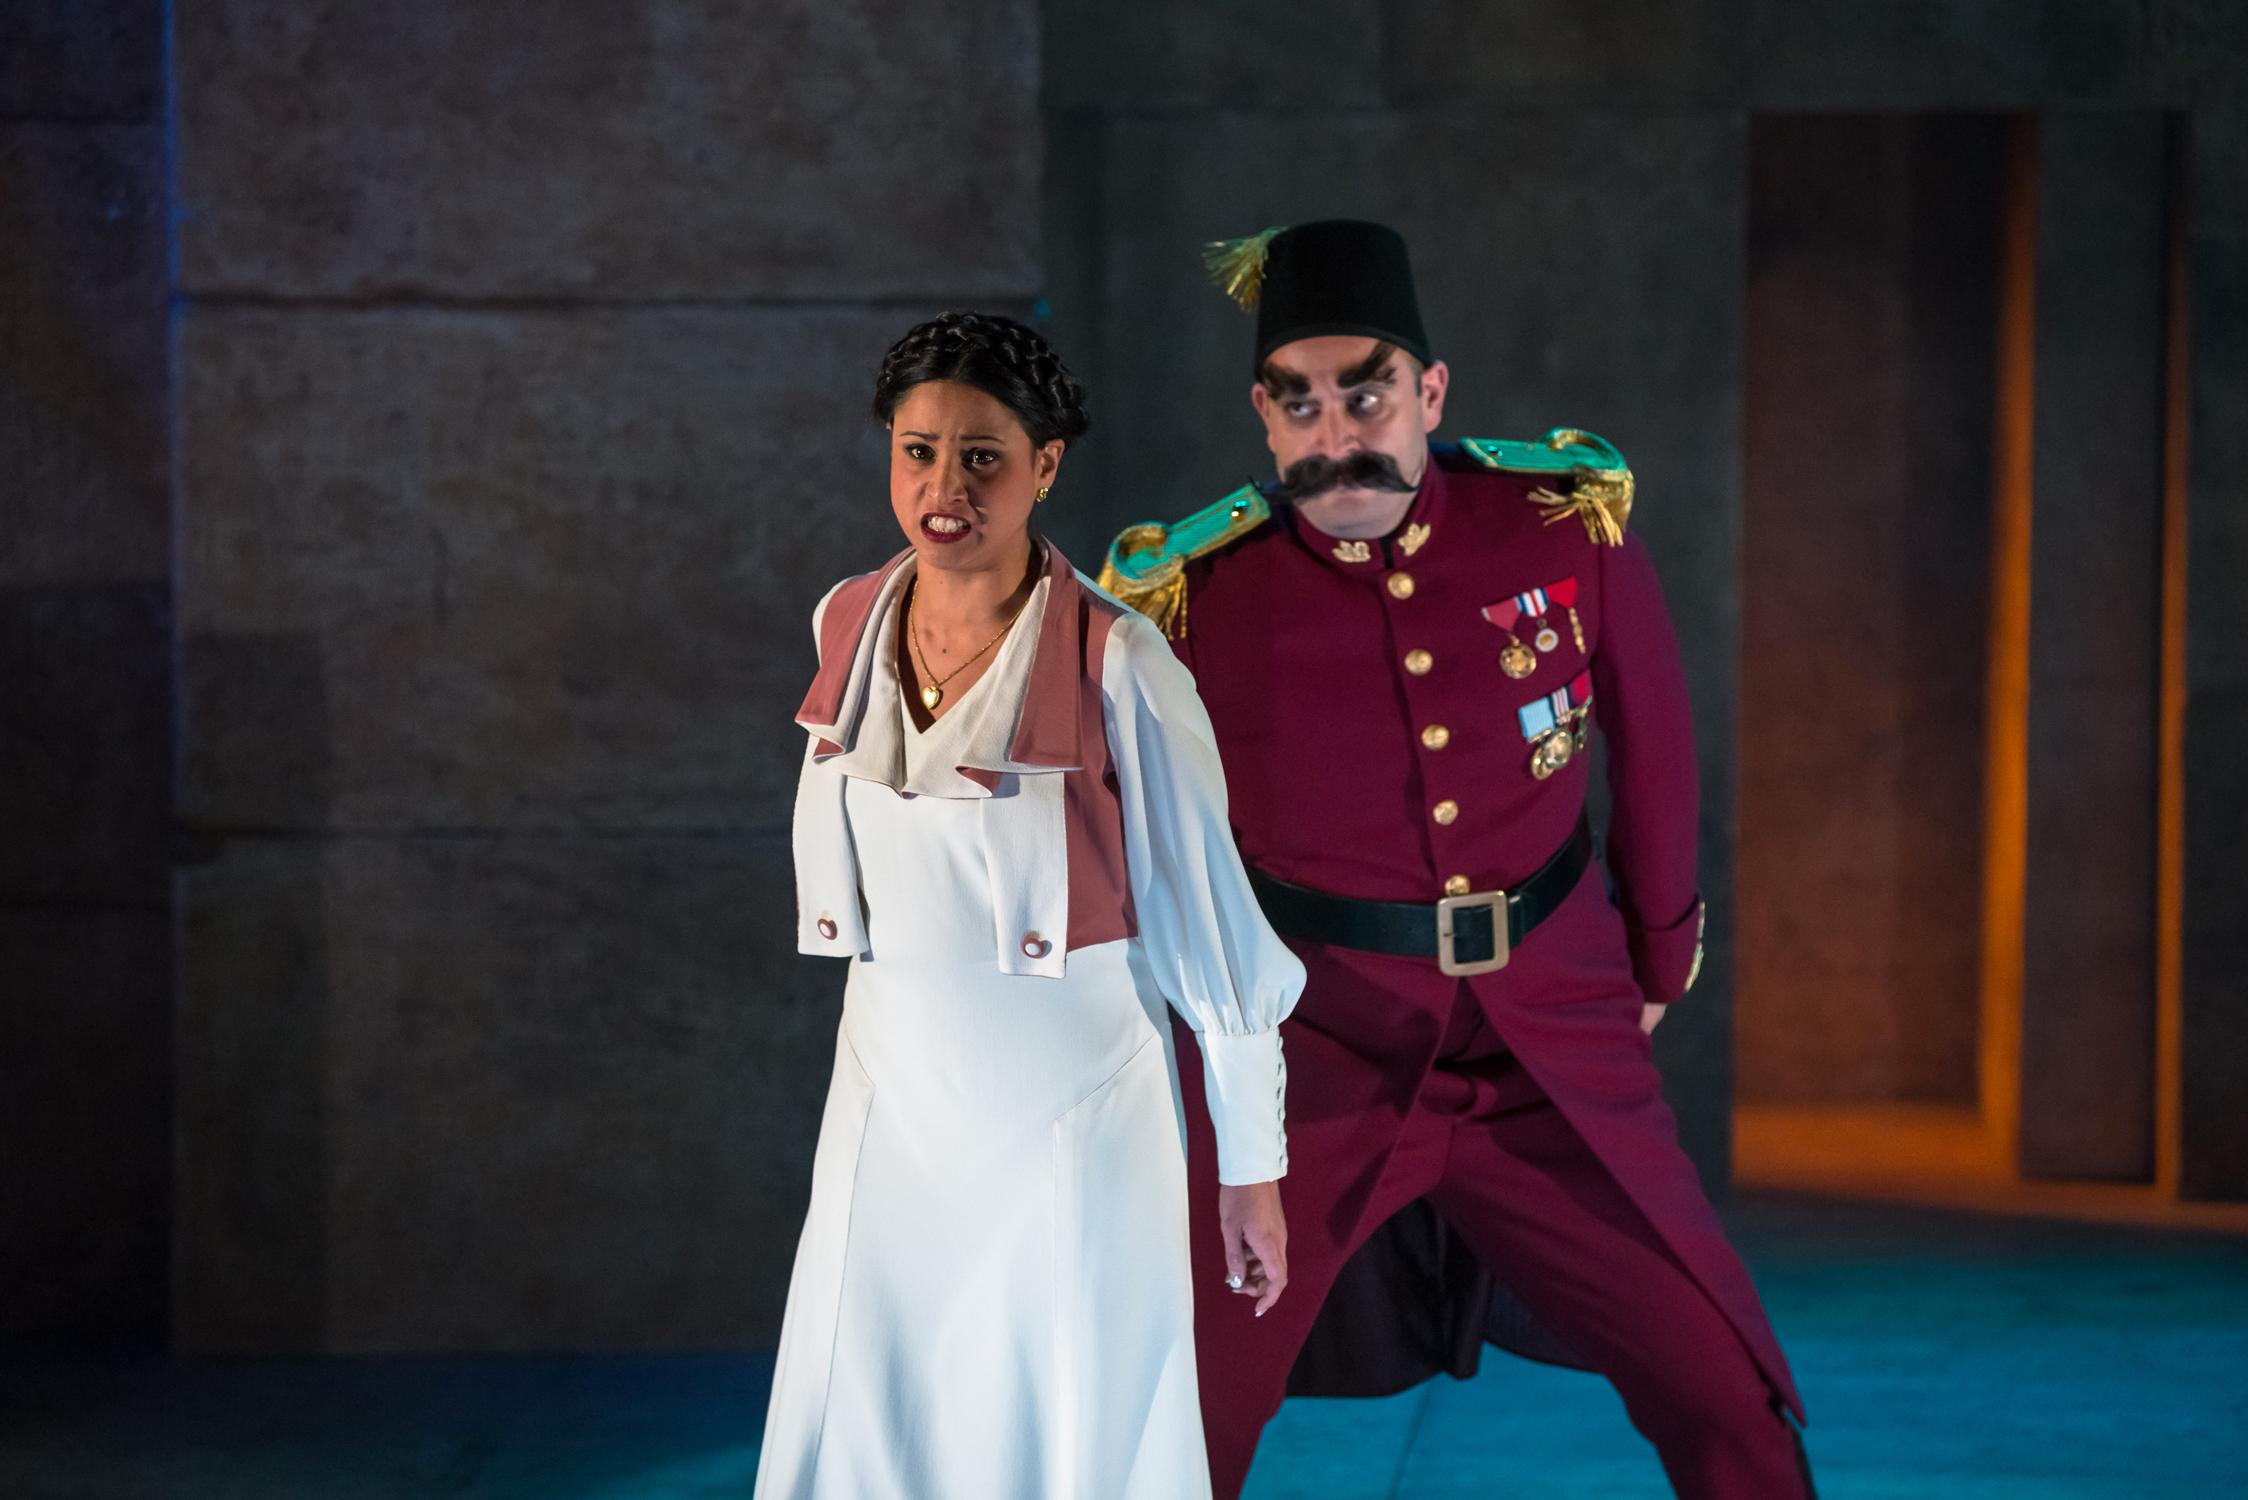 Stacey Alleaume as Pamina, Benjamin Rasheed as Monostatos. Photo:©Albert Comper